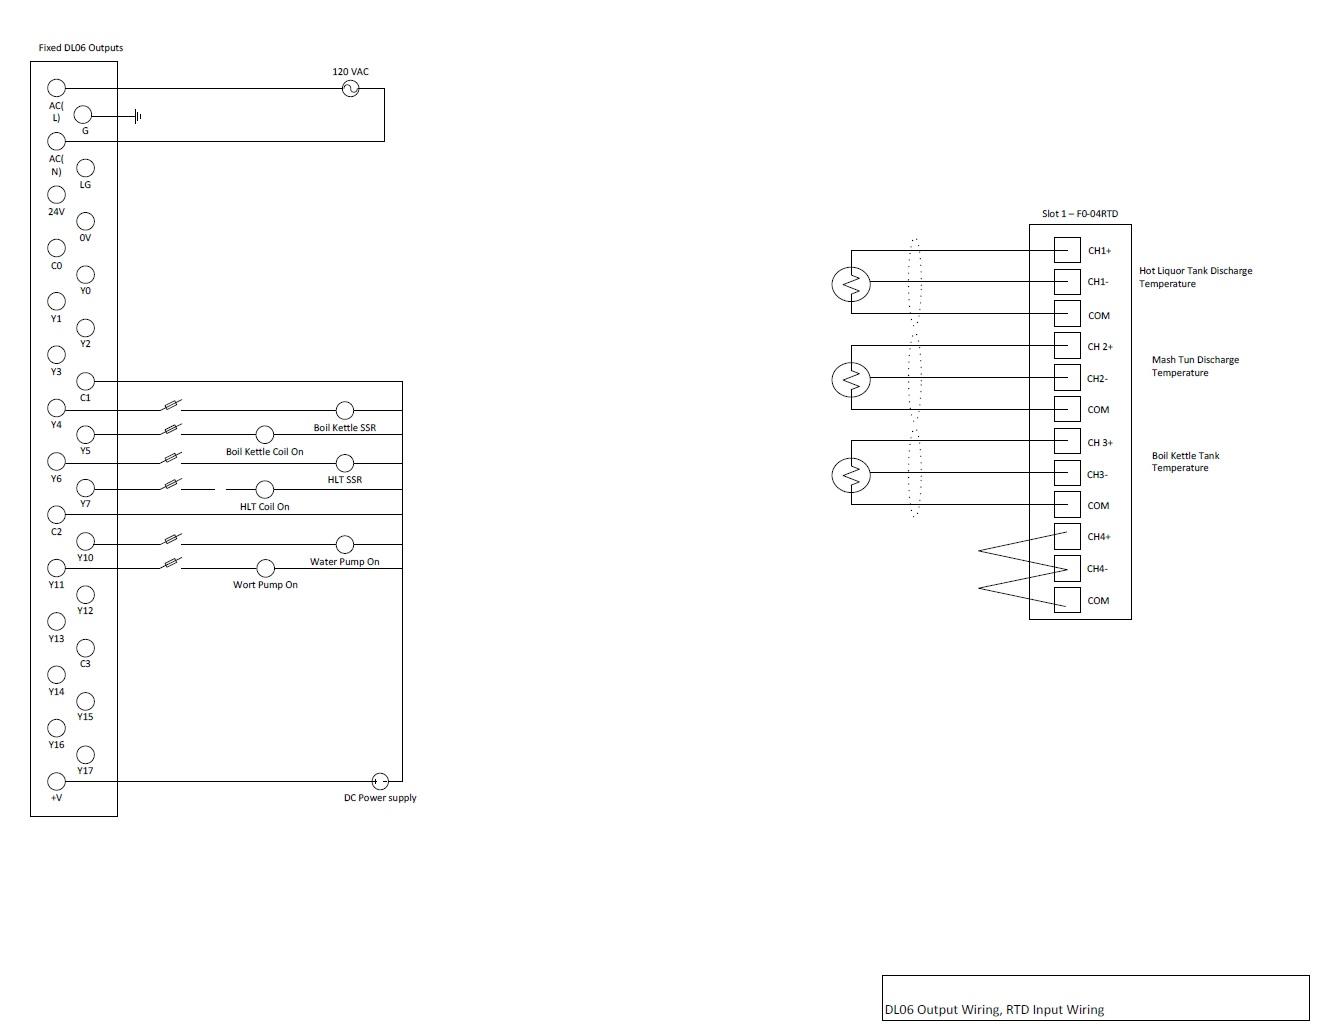 Wecon Plc Wiring Diagram Auto Electrical Wiring Diagram